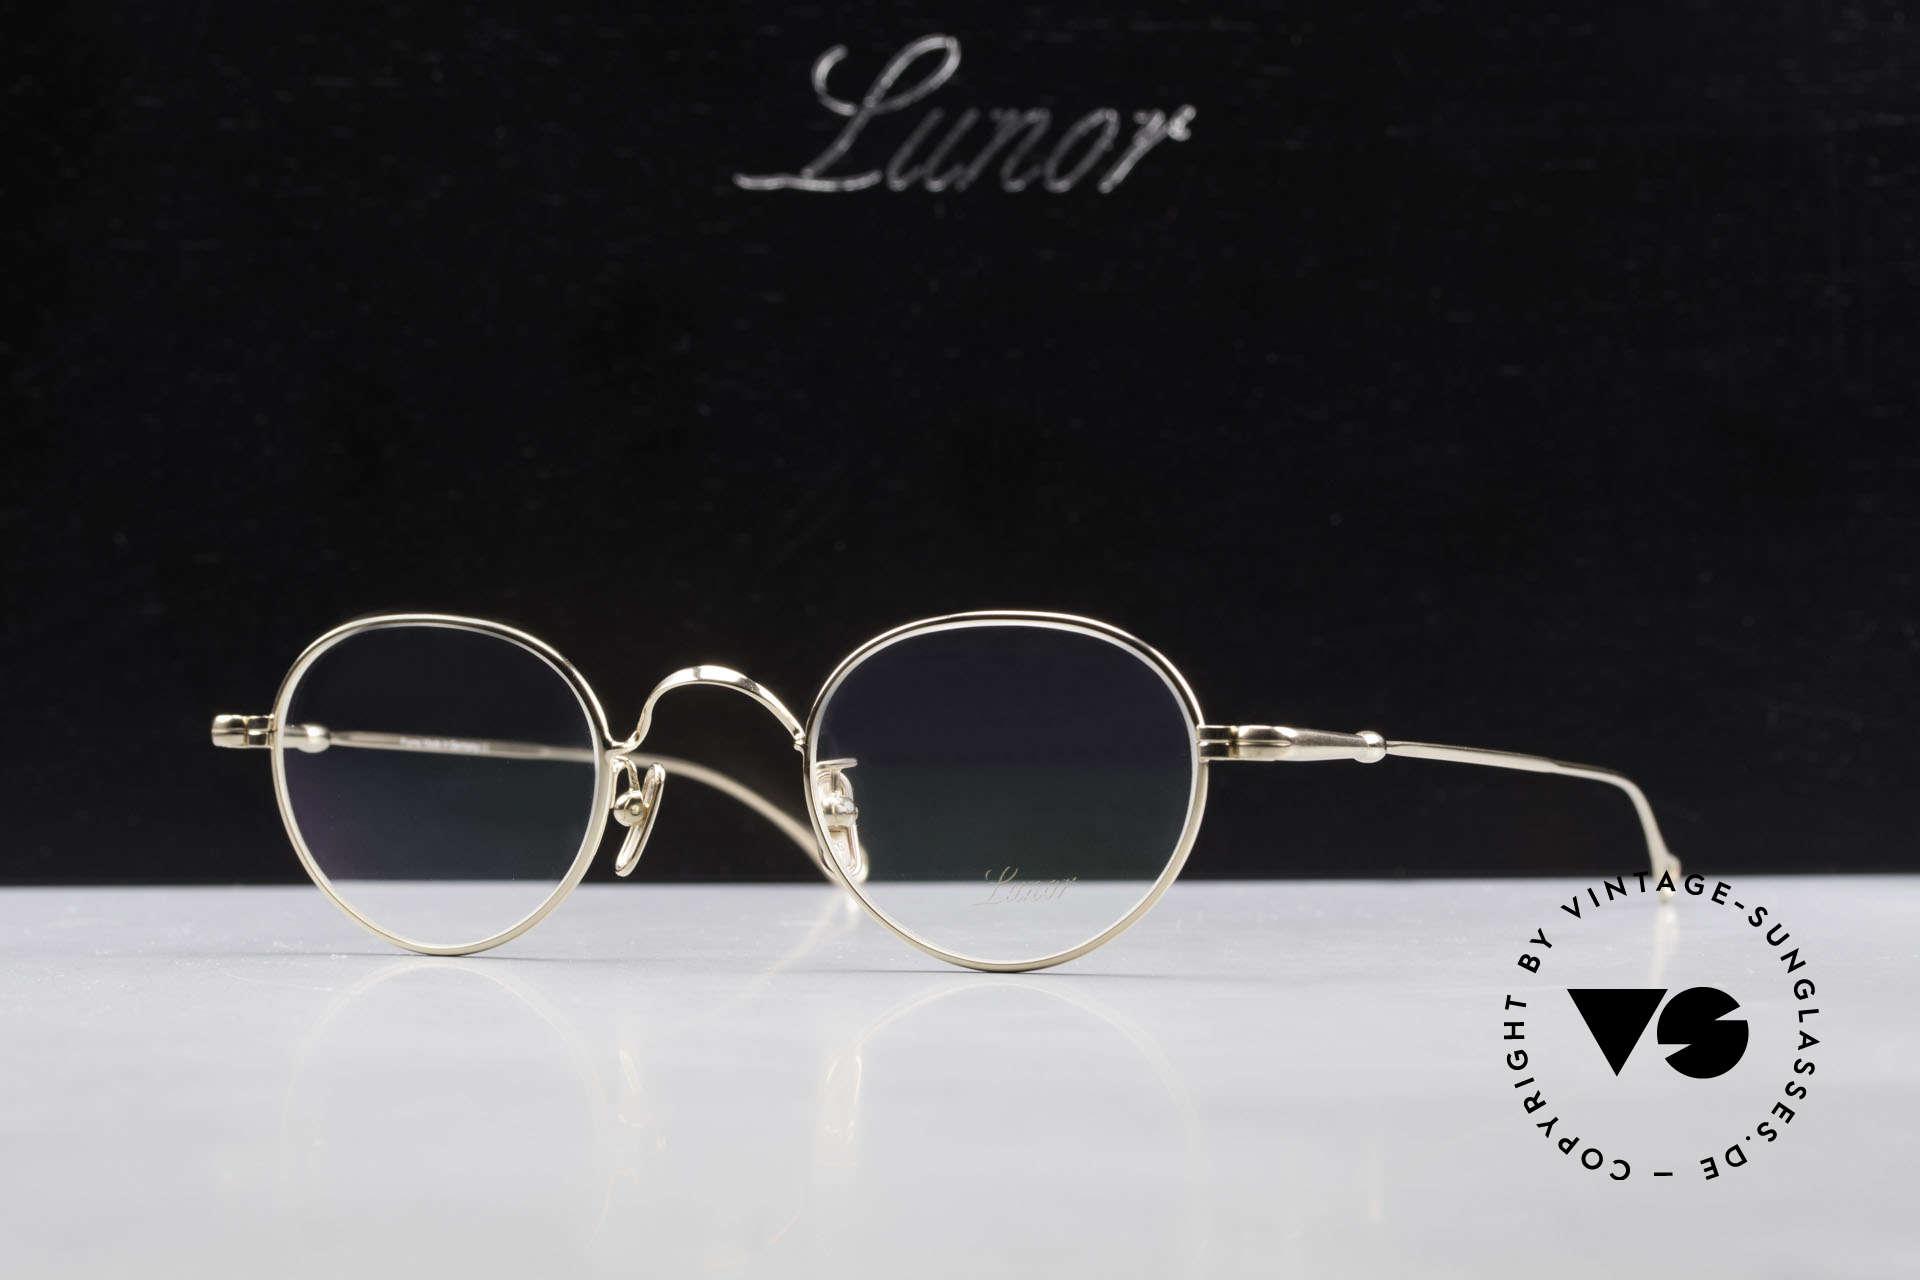 Lunor V 107 Panto Eyeglasses Gold Plated, Size: medium, Made for Men